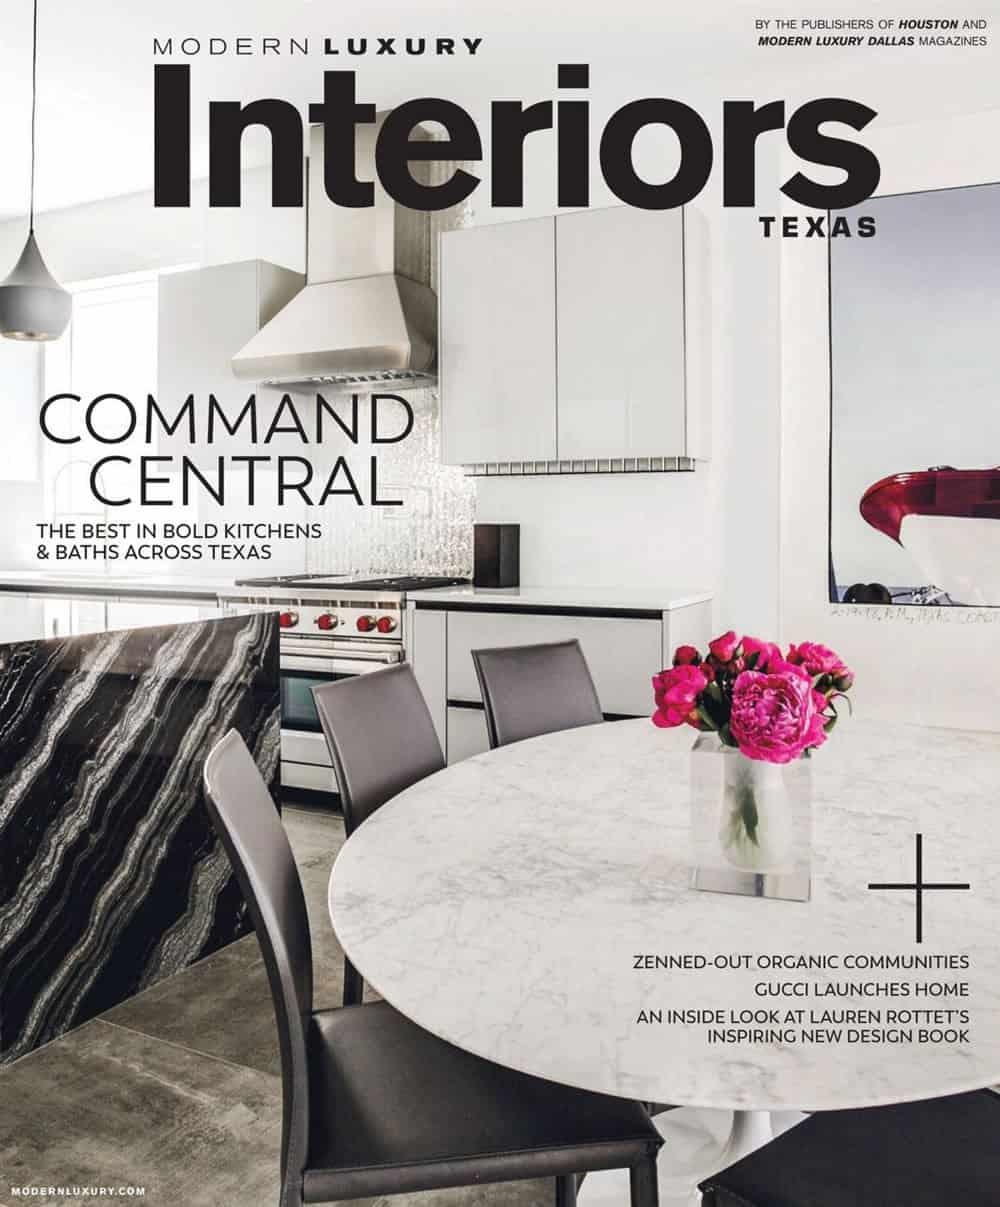 Modern Luxury Interiors Texas magazine cover for November 2017 edition